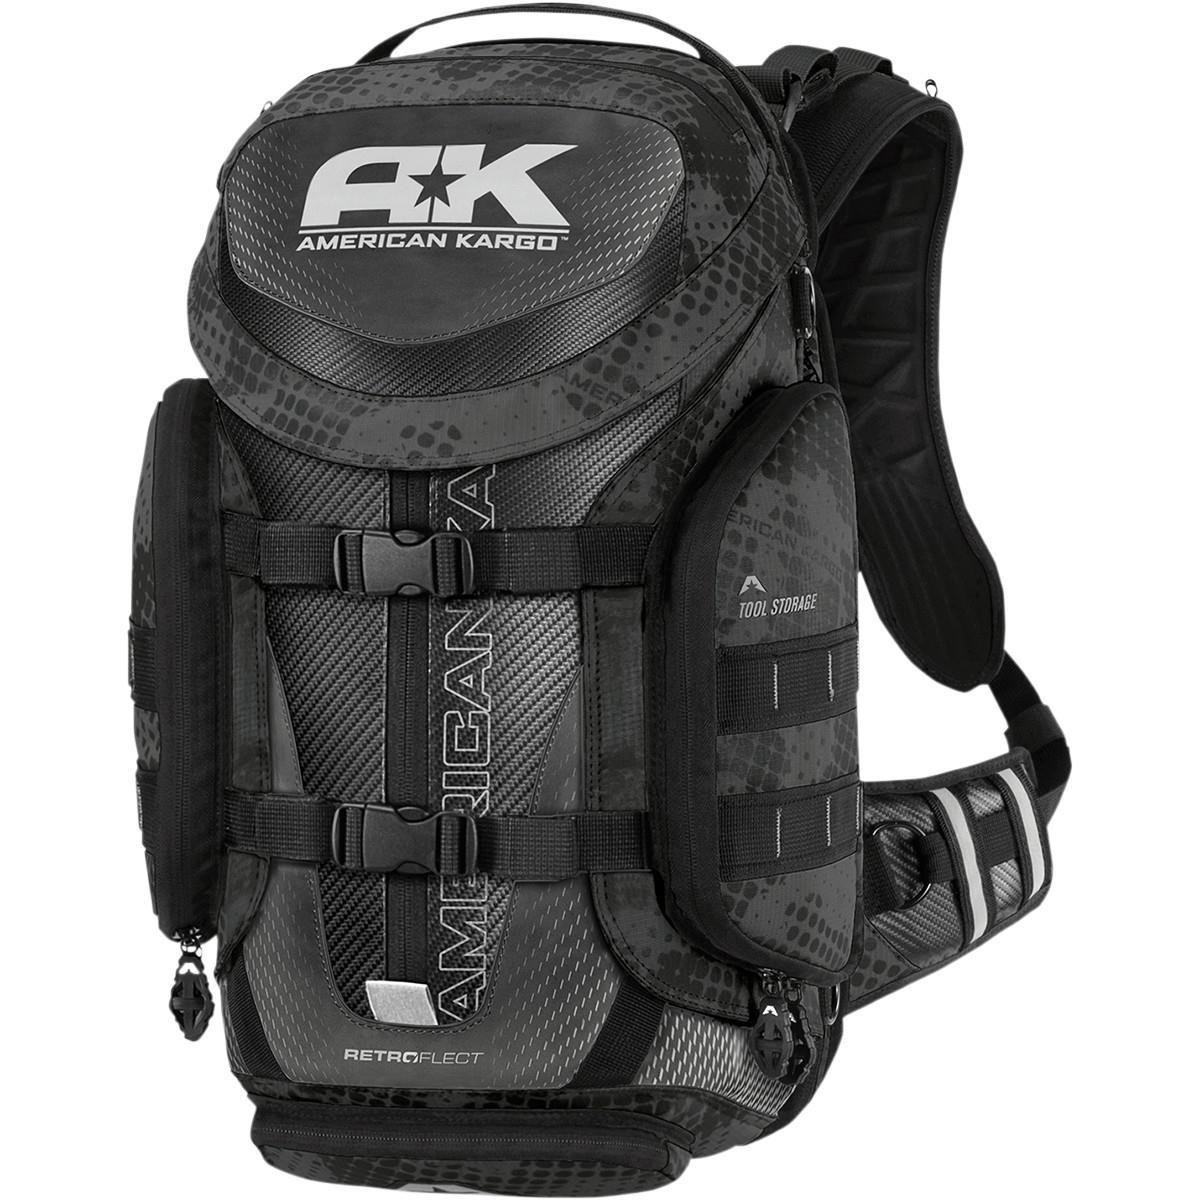 American Kargo 3517-0407 Reflective Black Trooper Backpack